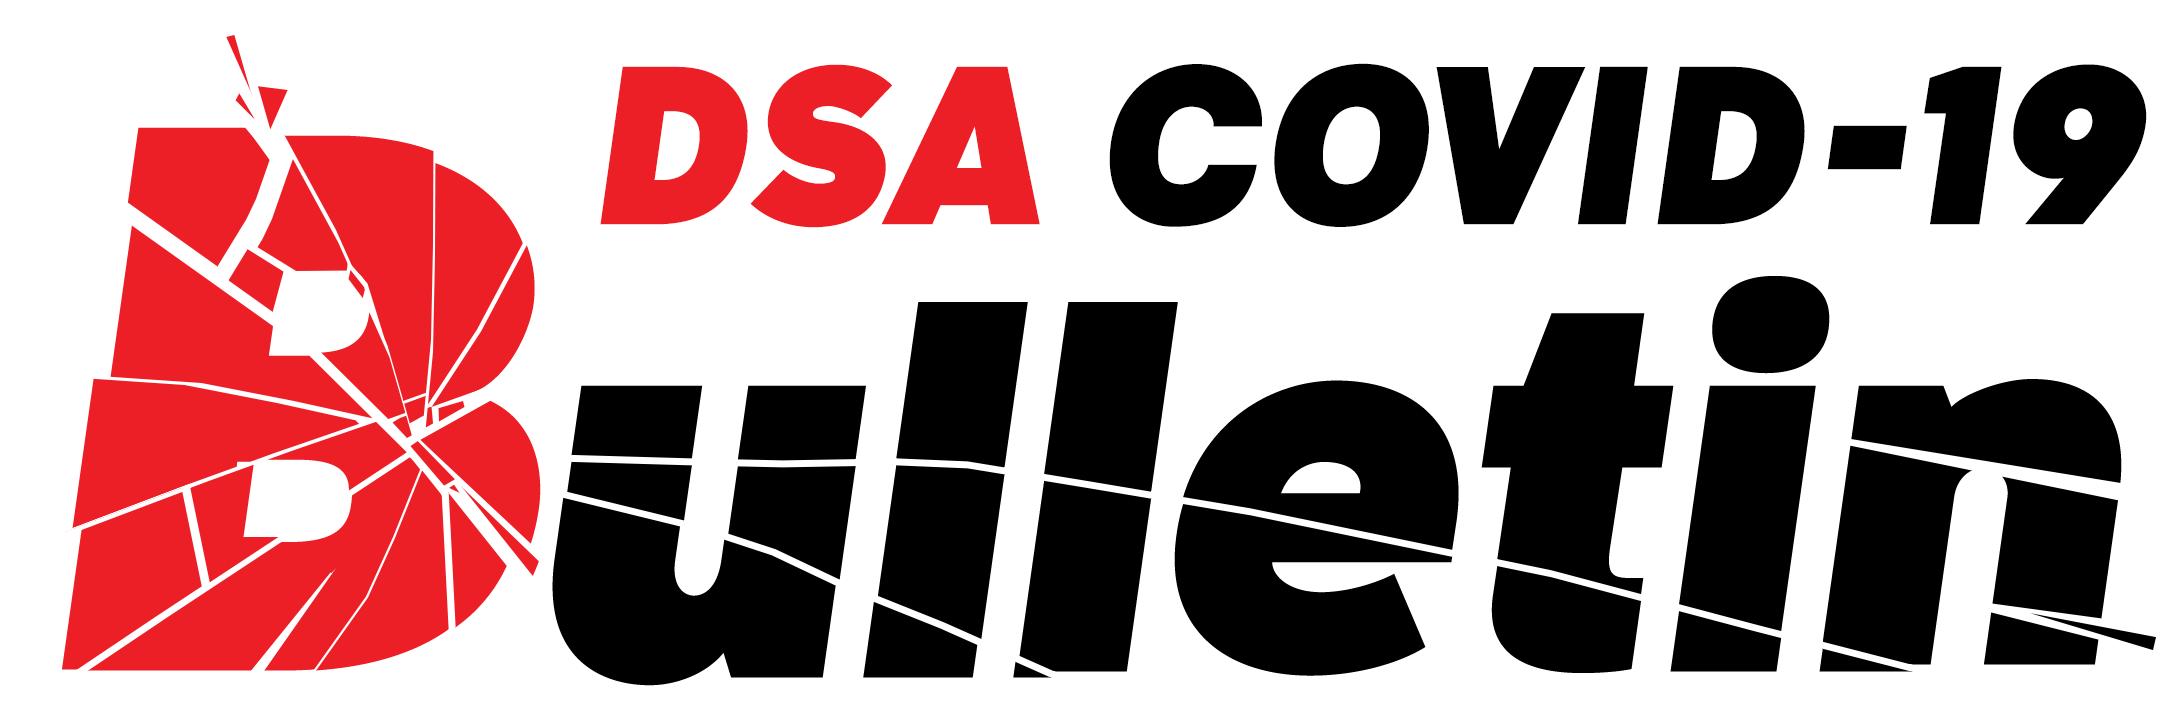 DSA COVID19 Bulletin